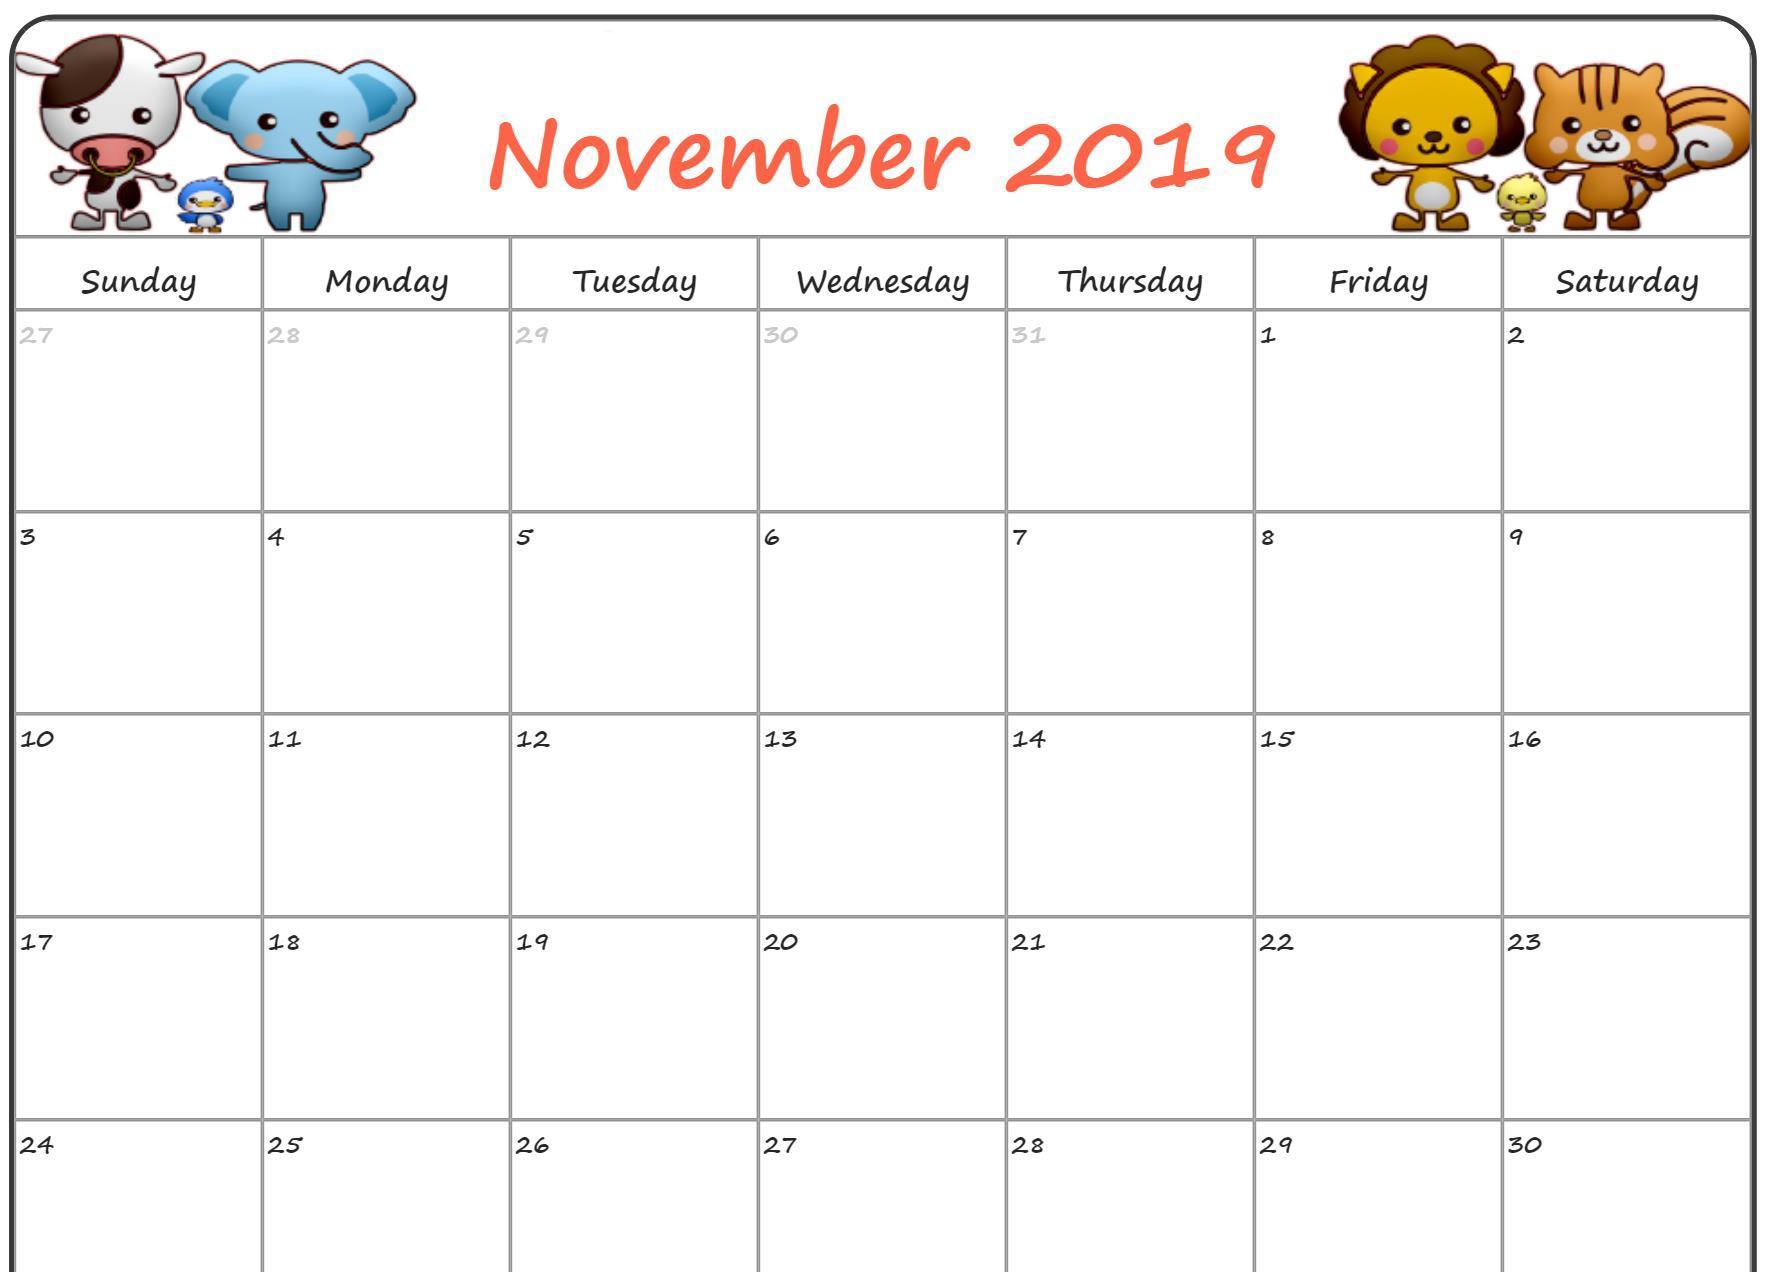 Leere November 2019 Kalender